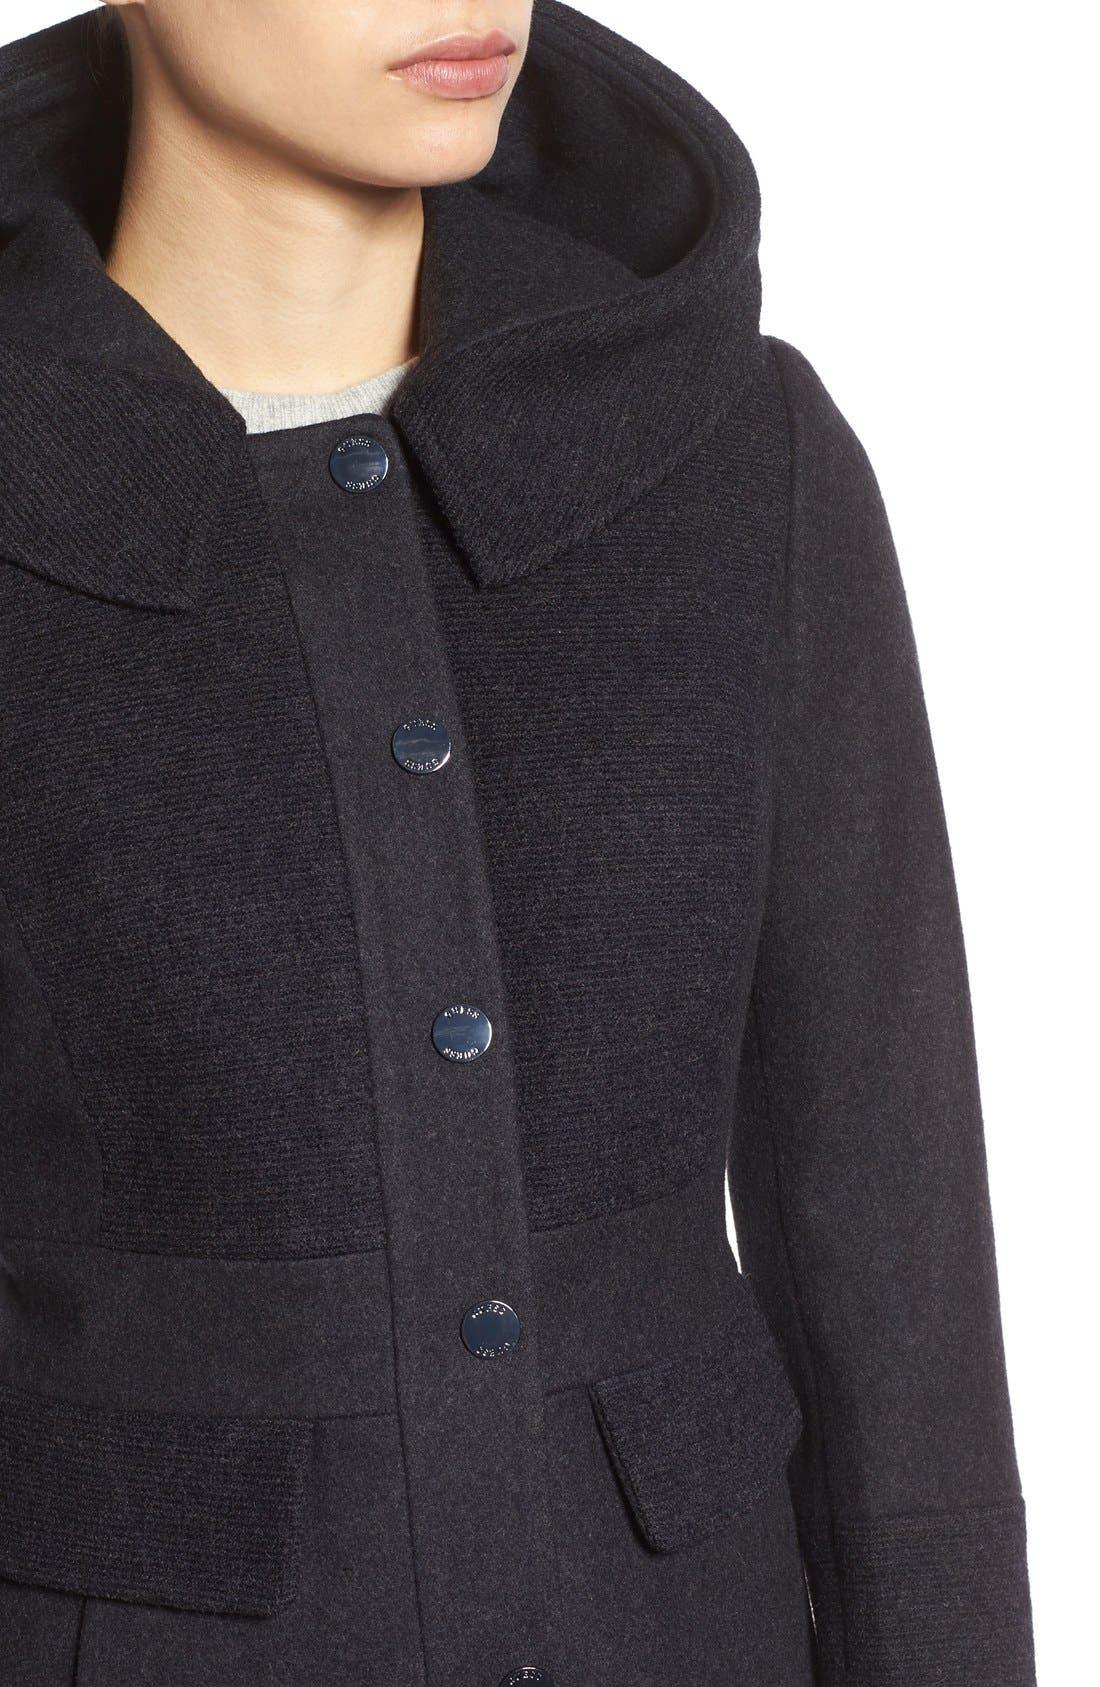 Wool Blend Hooded Coat,                             Alternate thumbnail 4, color,